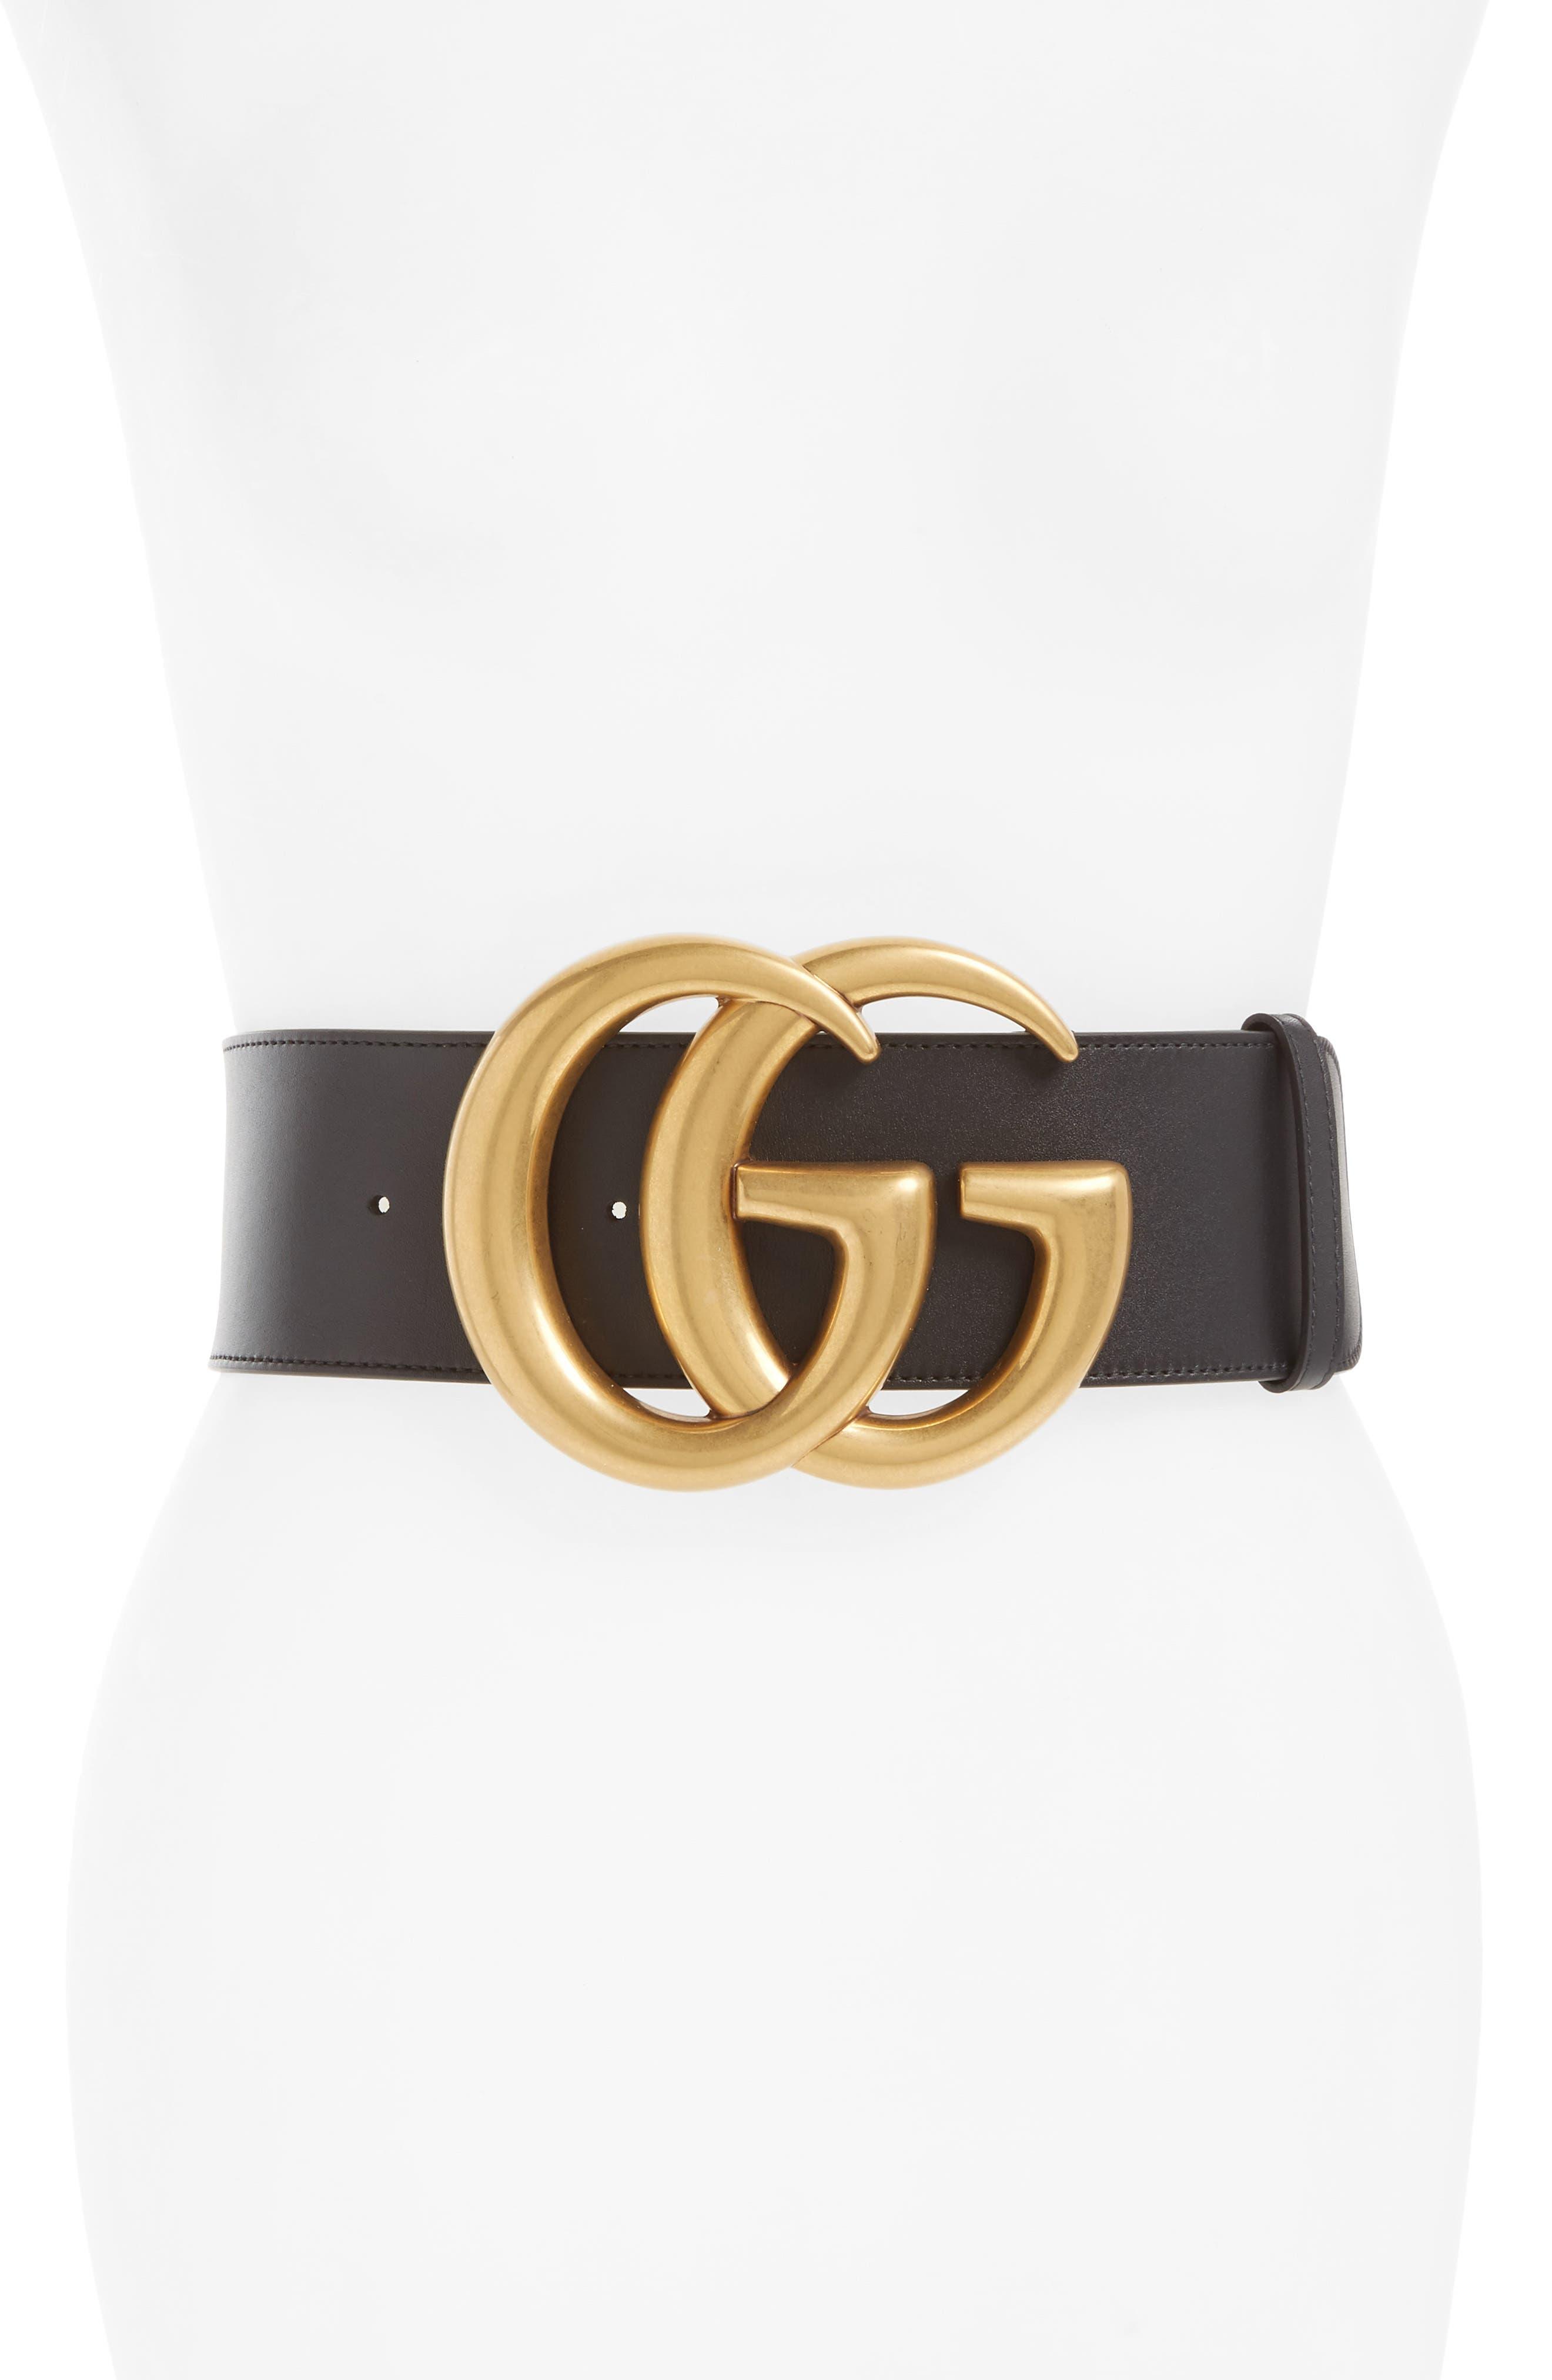 GG Leather Belt,                         Main,                         color,